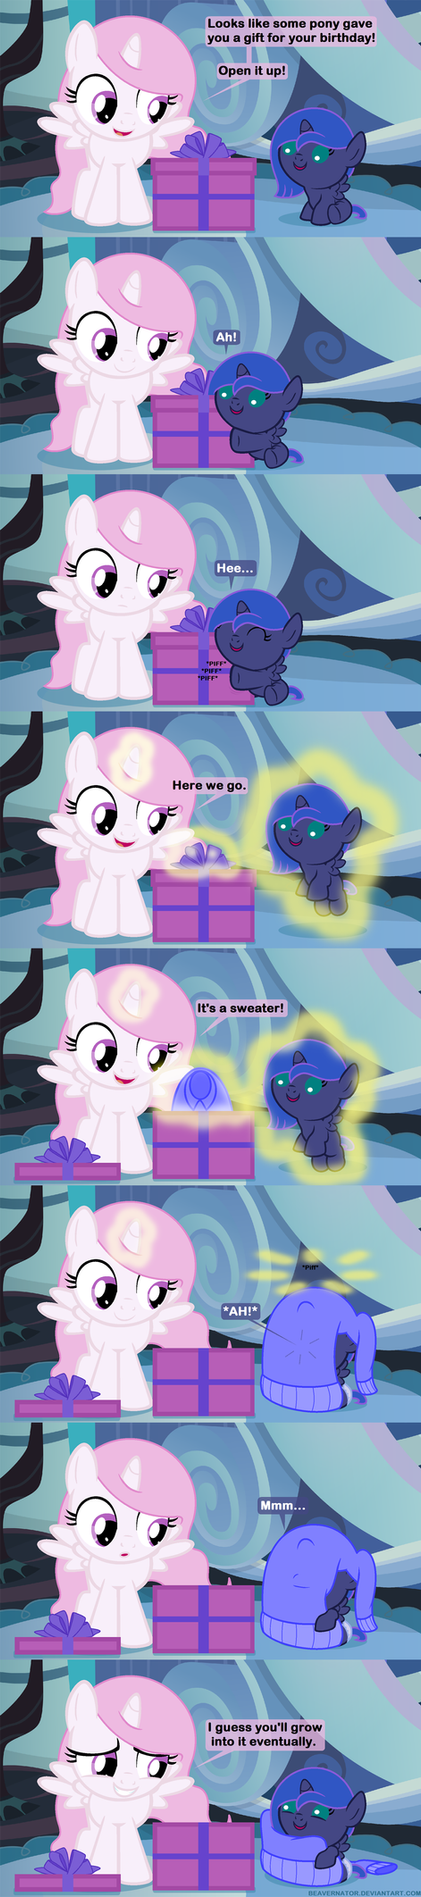 Woona's Gift by Beavernator